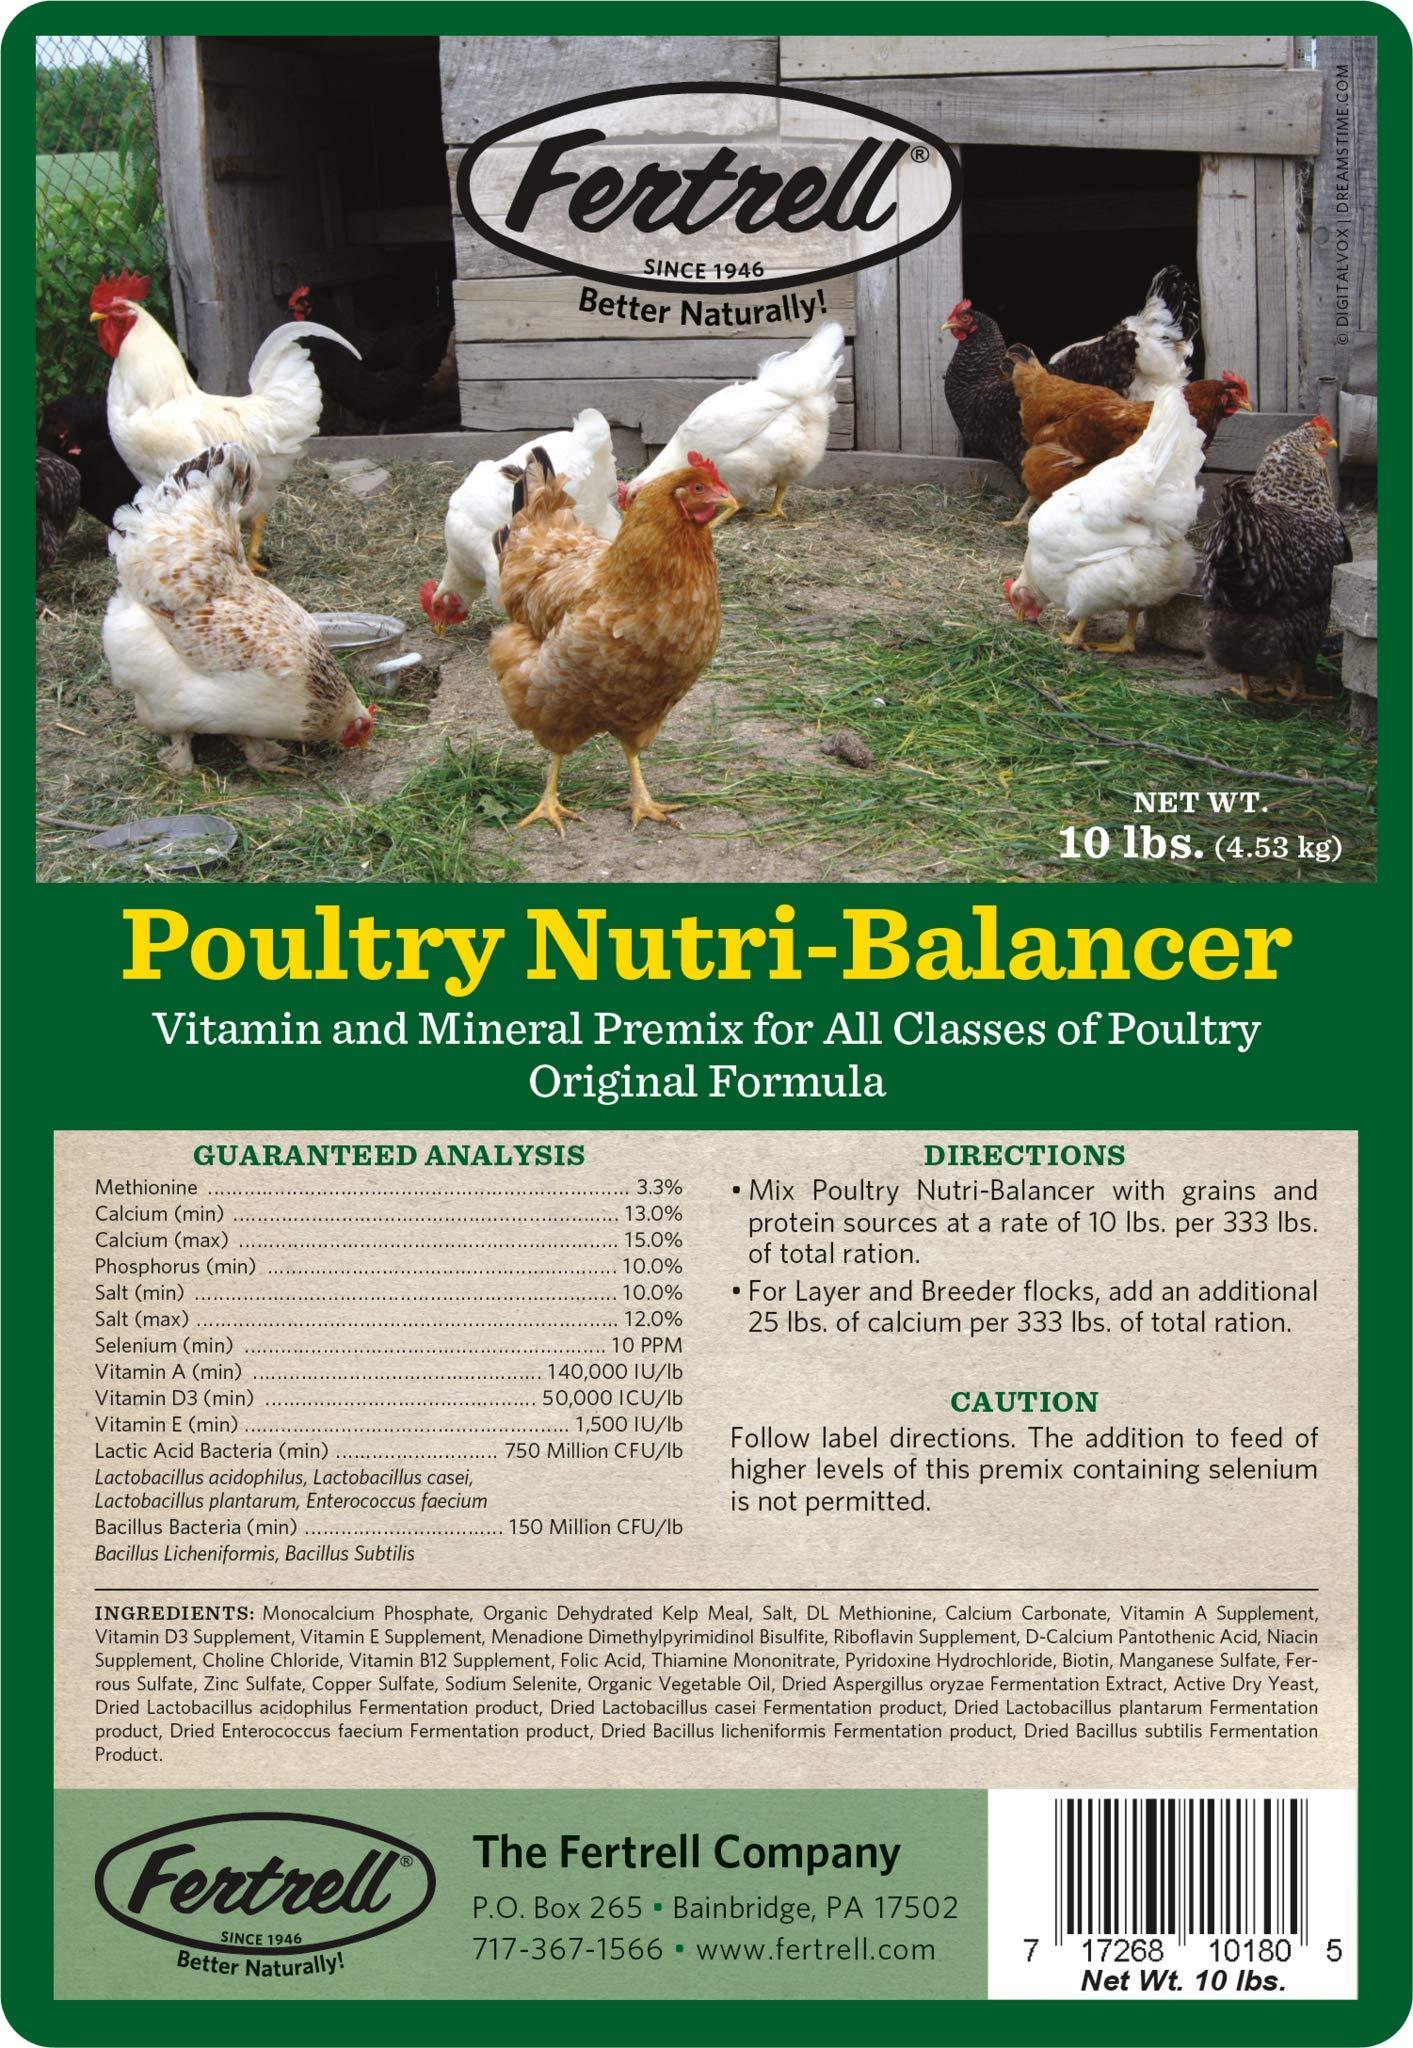 Fertrell Poultry Nutri-Balancer by Fertrell